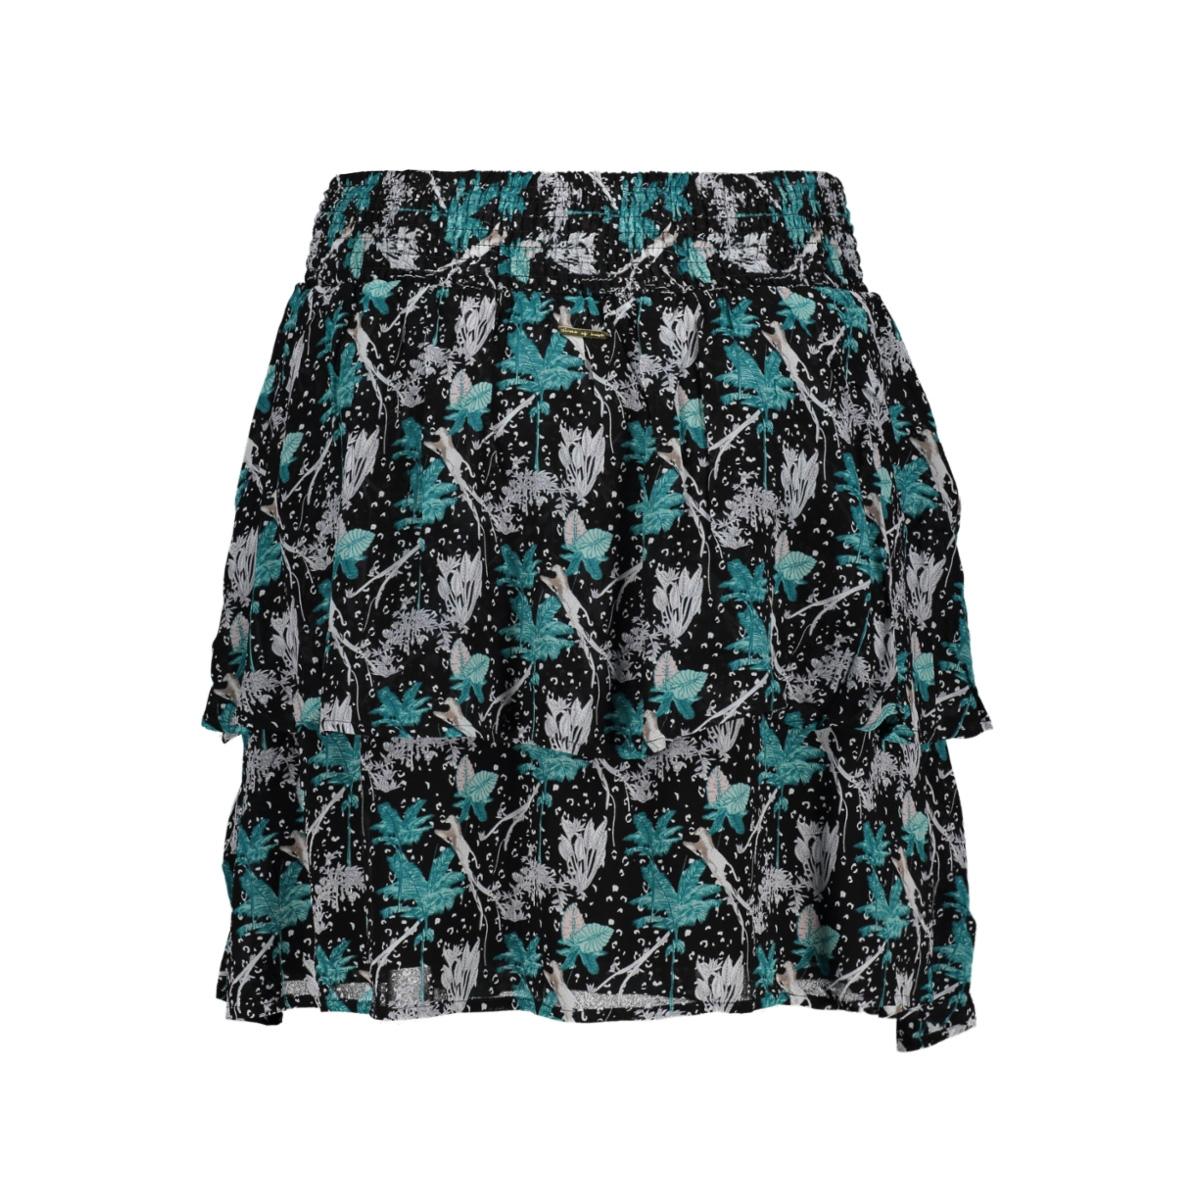 yente skirt s20 3 3301 circle of trust rok jungle